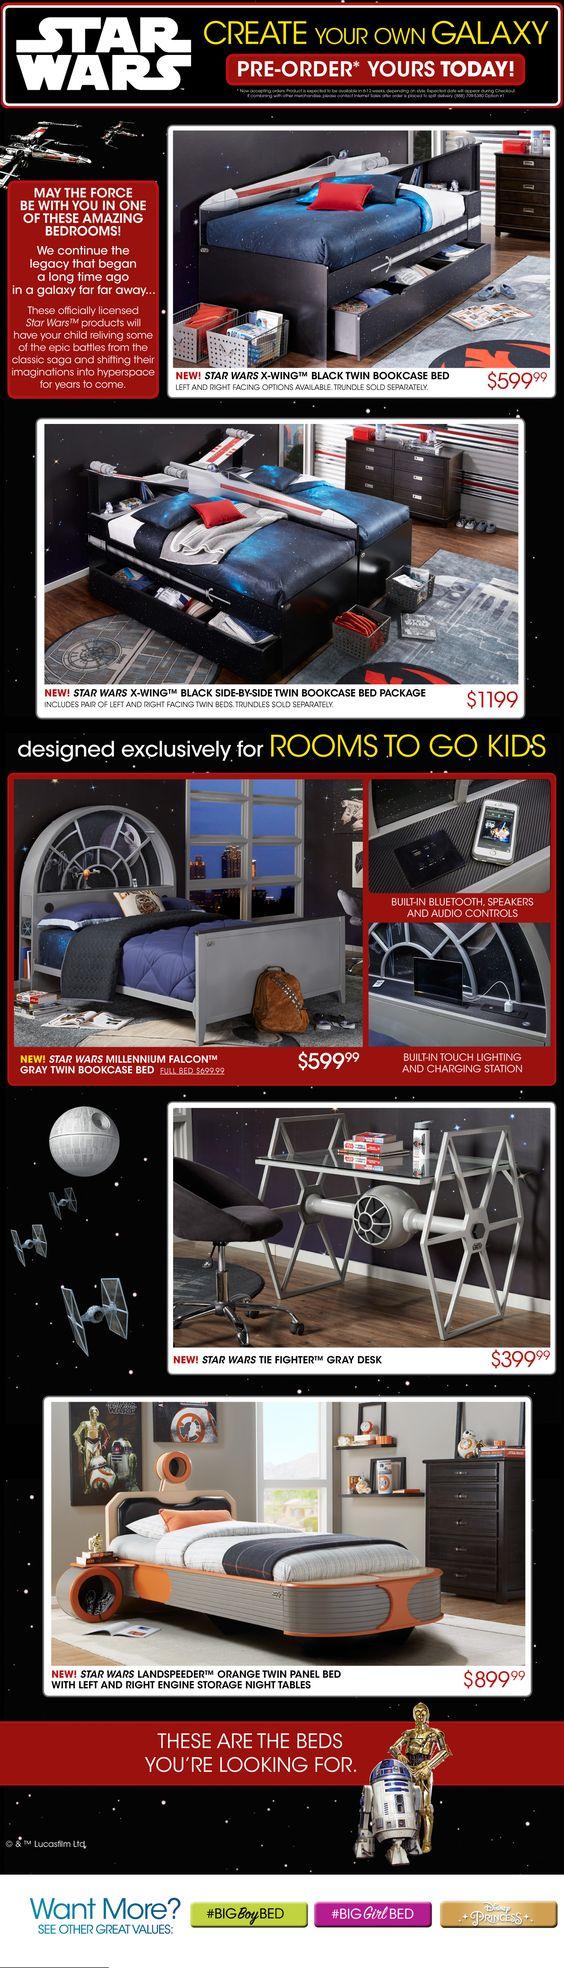 Kids Bedroom Furniture Store Buy Kids Furniture Affordable Kids Bedroom Furniture Sets For